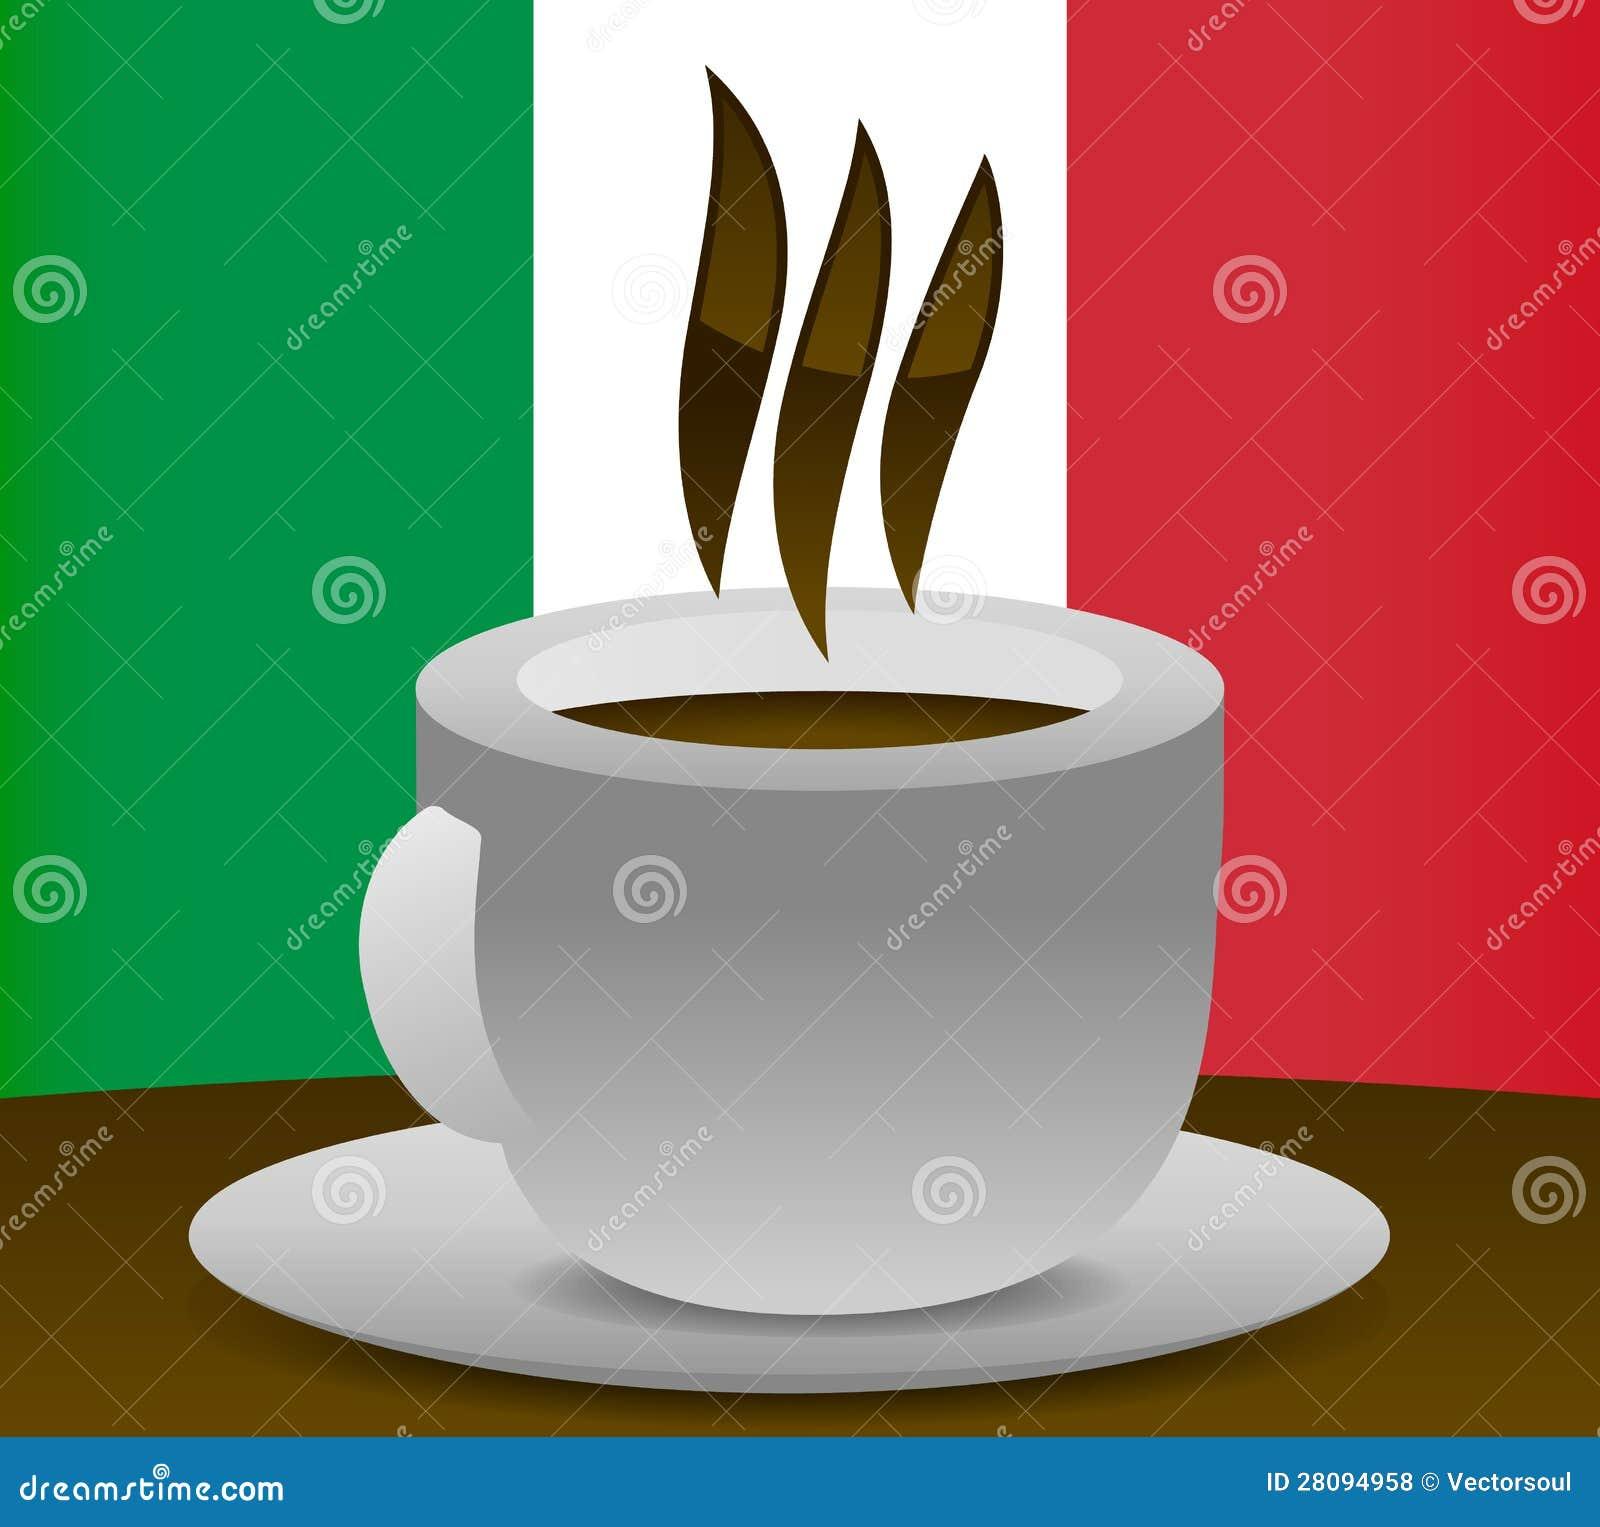 Italian coffee - Italian flag in the background. Nice, crisp ...